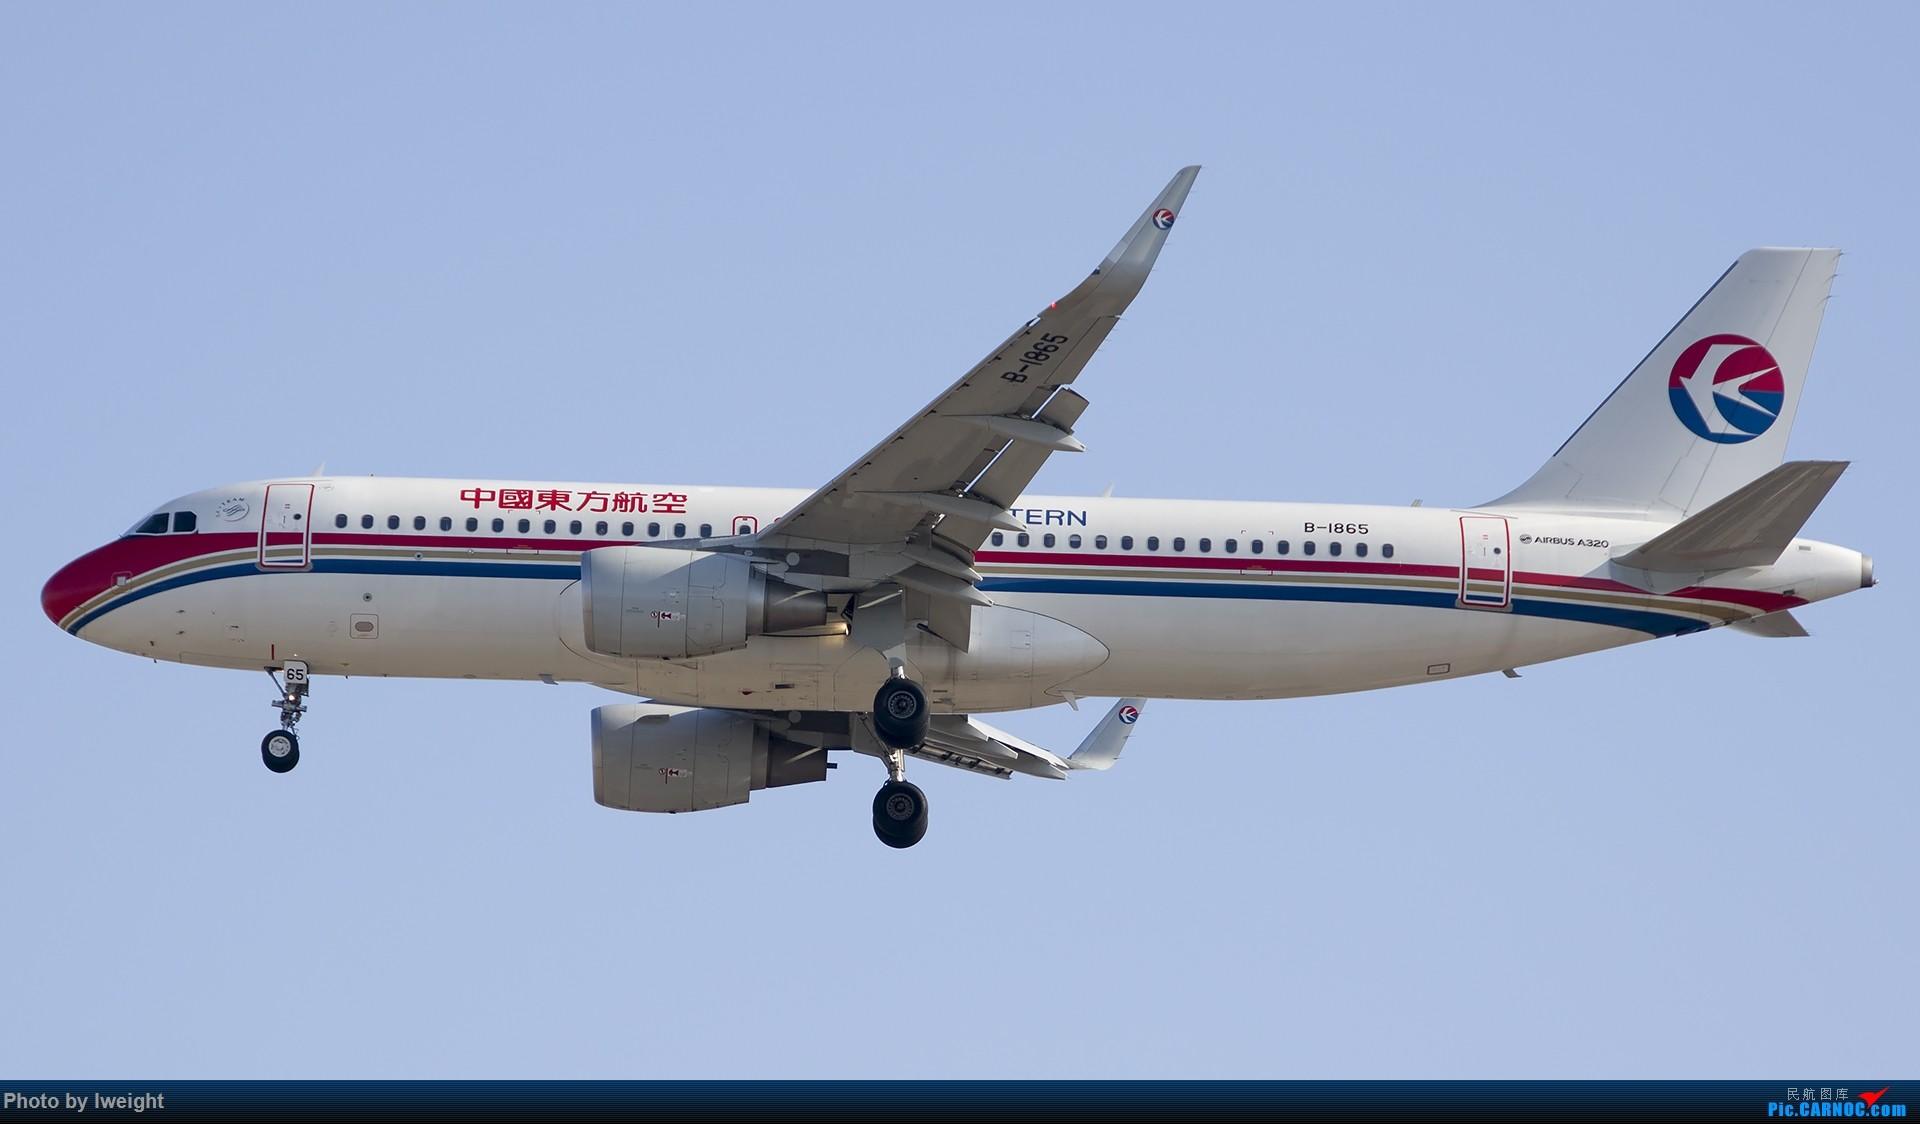 Re:[原创]庆祝升级777,发上今天在首都机场拍的所有飞机【2014-12-14】 AIRBUS A320-200 B-1865 中国北京首都国际机场